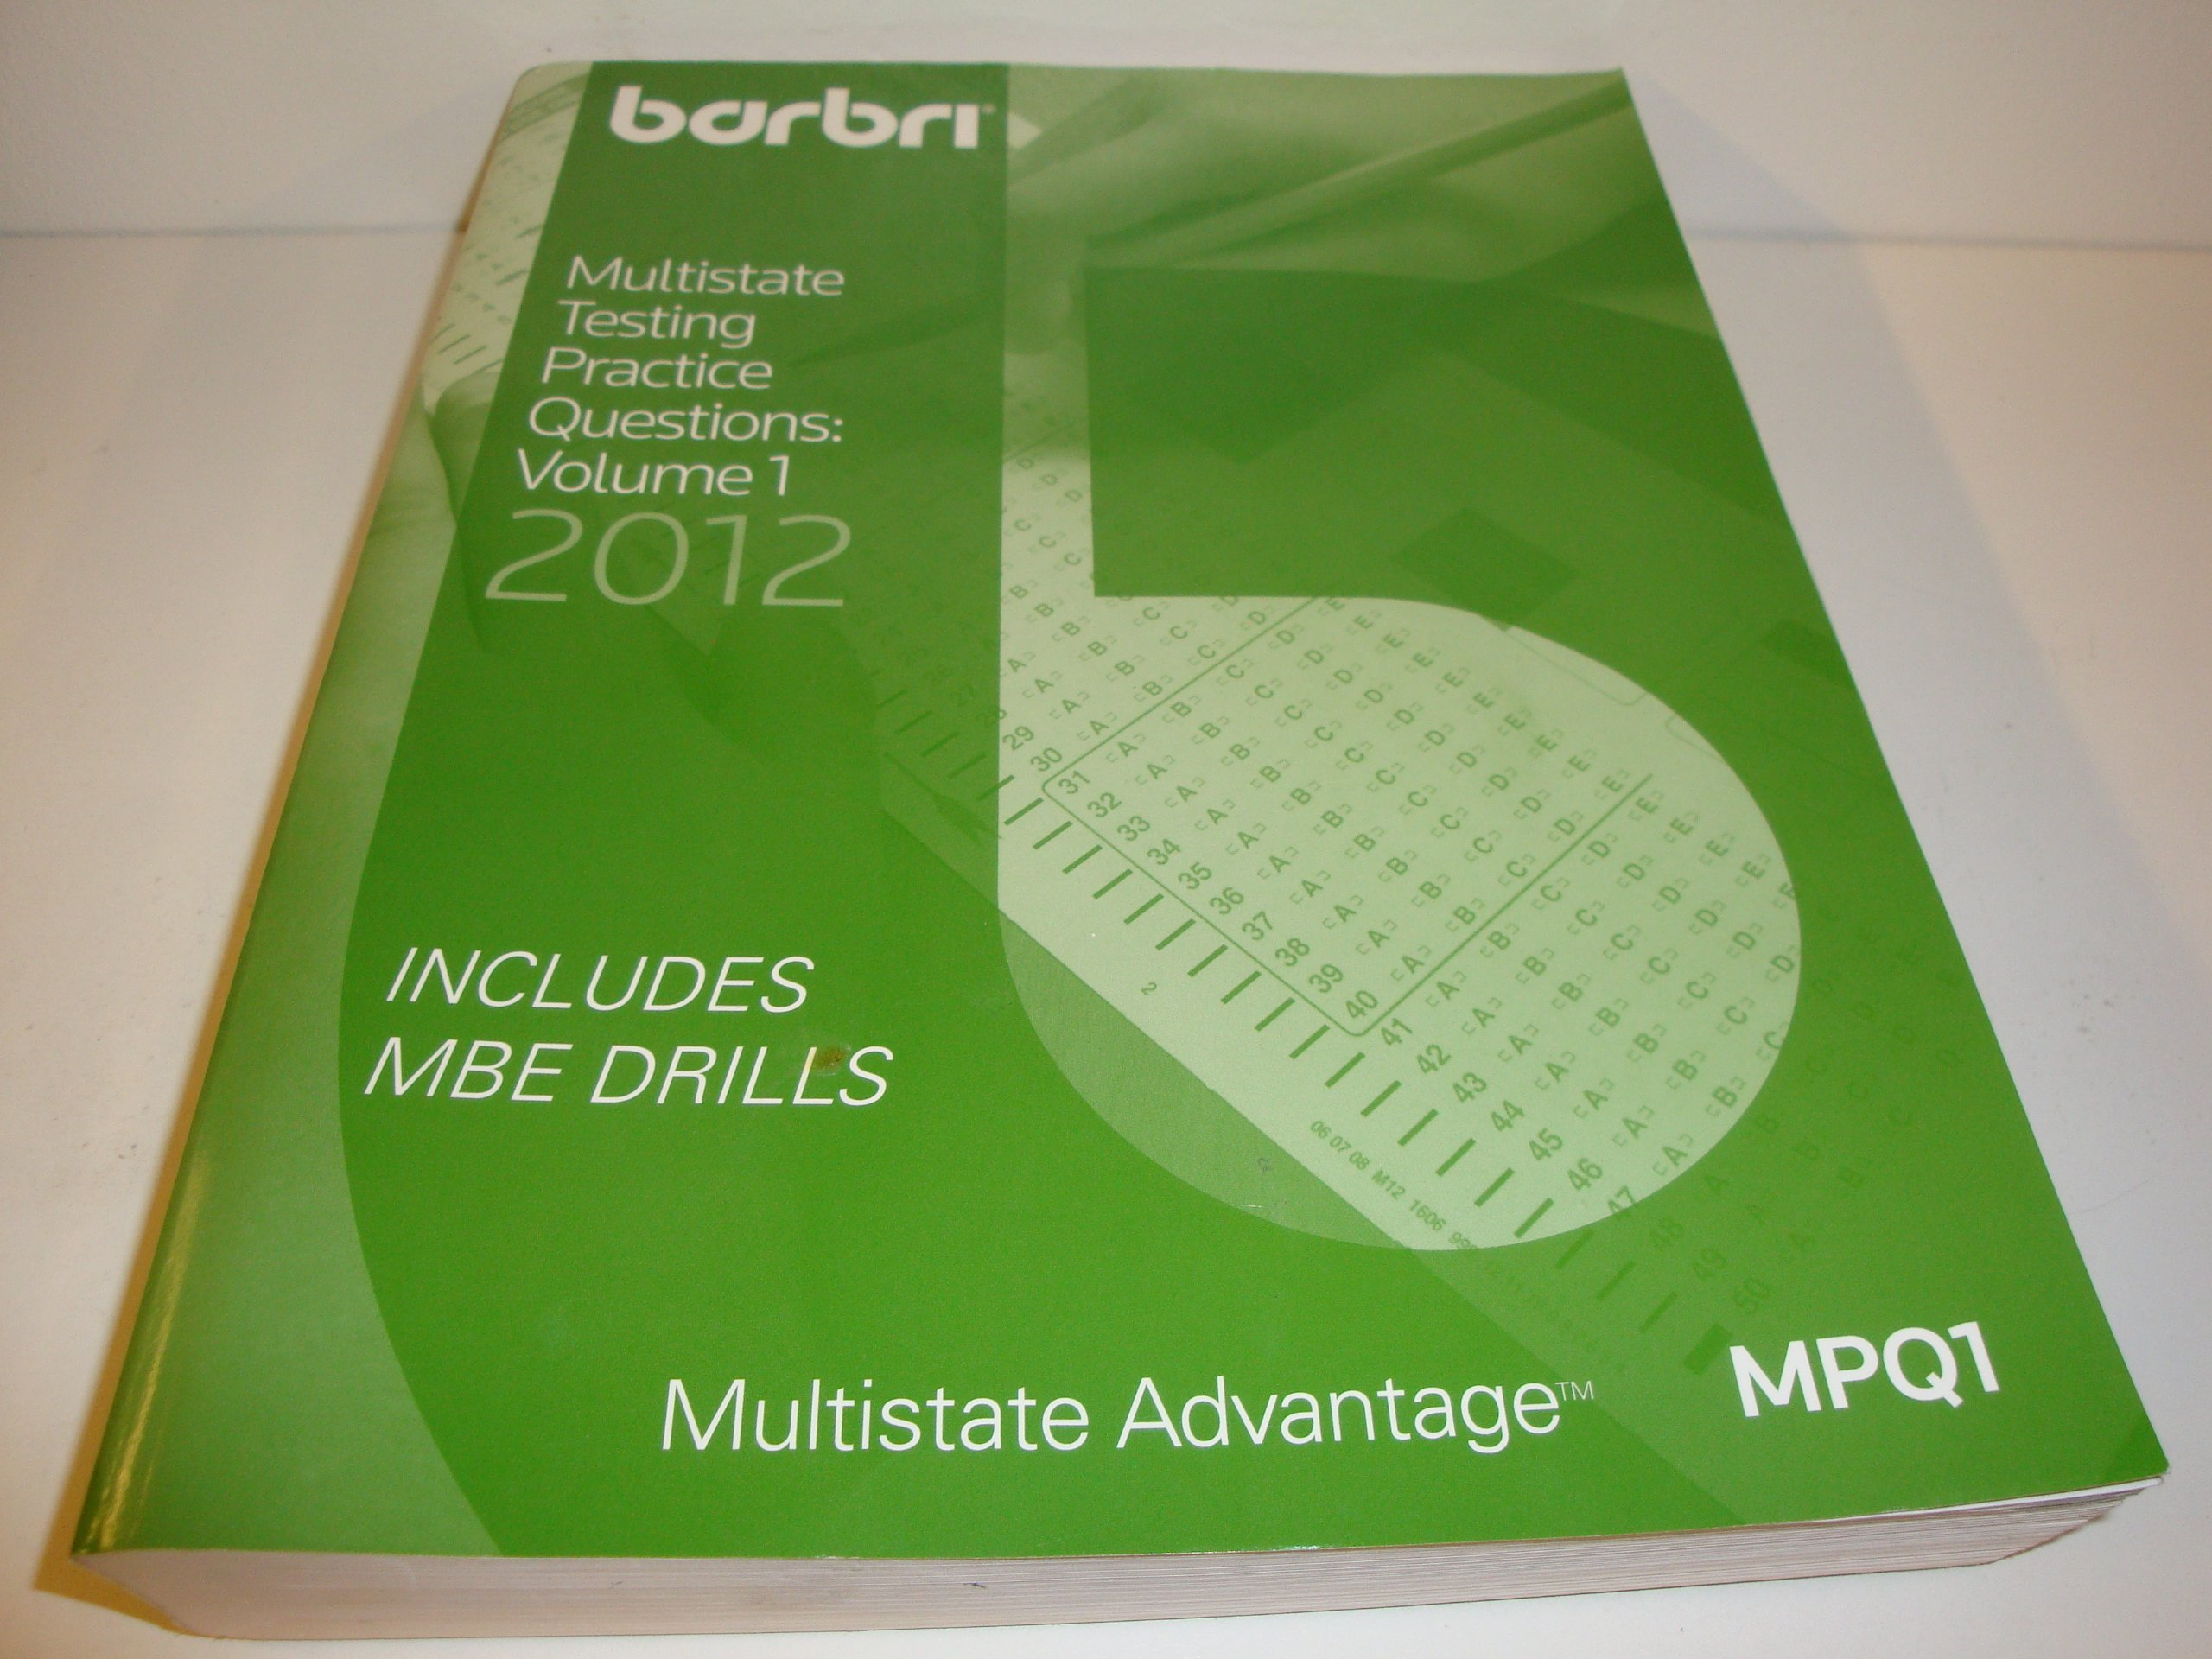 Barbri Multistate Testing Practice Questions Volume 1 Mutlistate Advantage Mpq1 2012 pdf epub